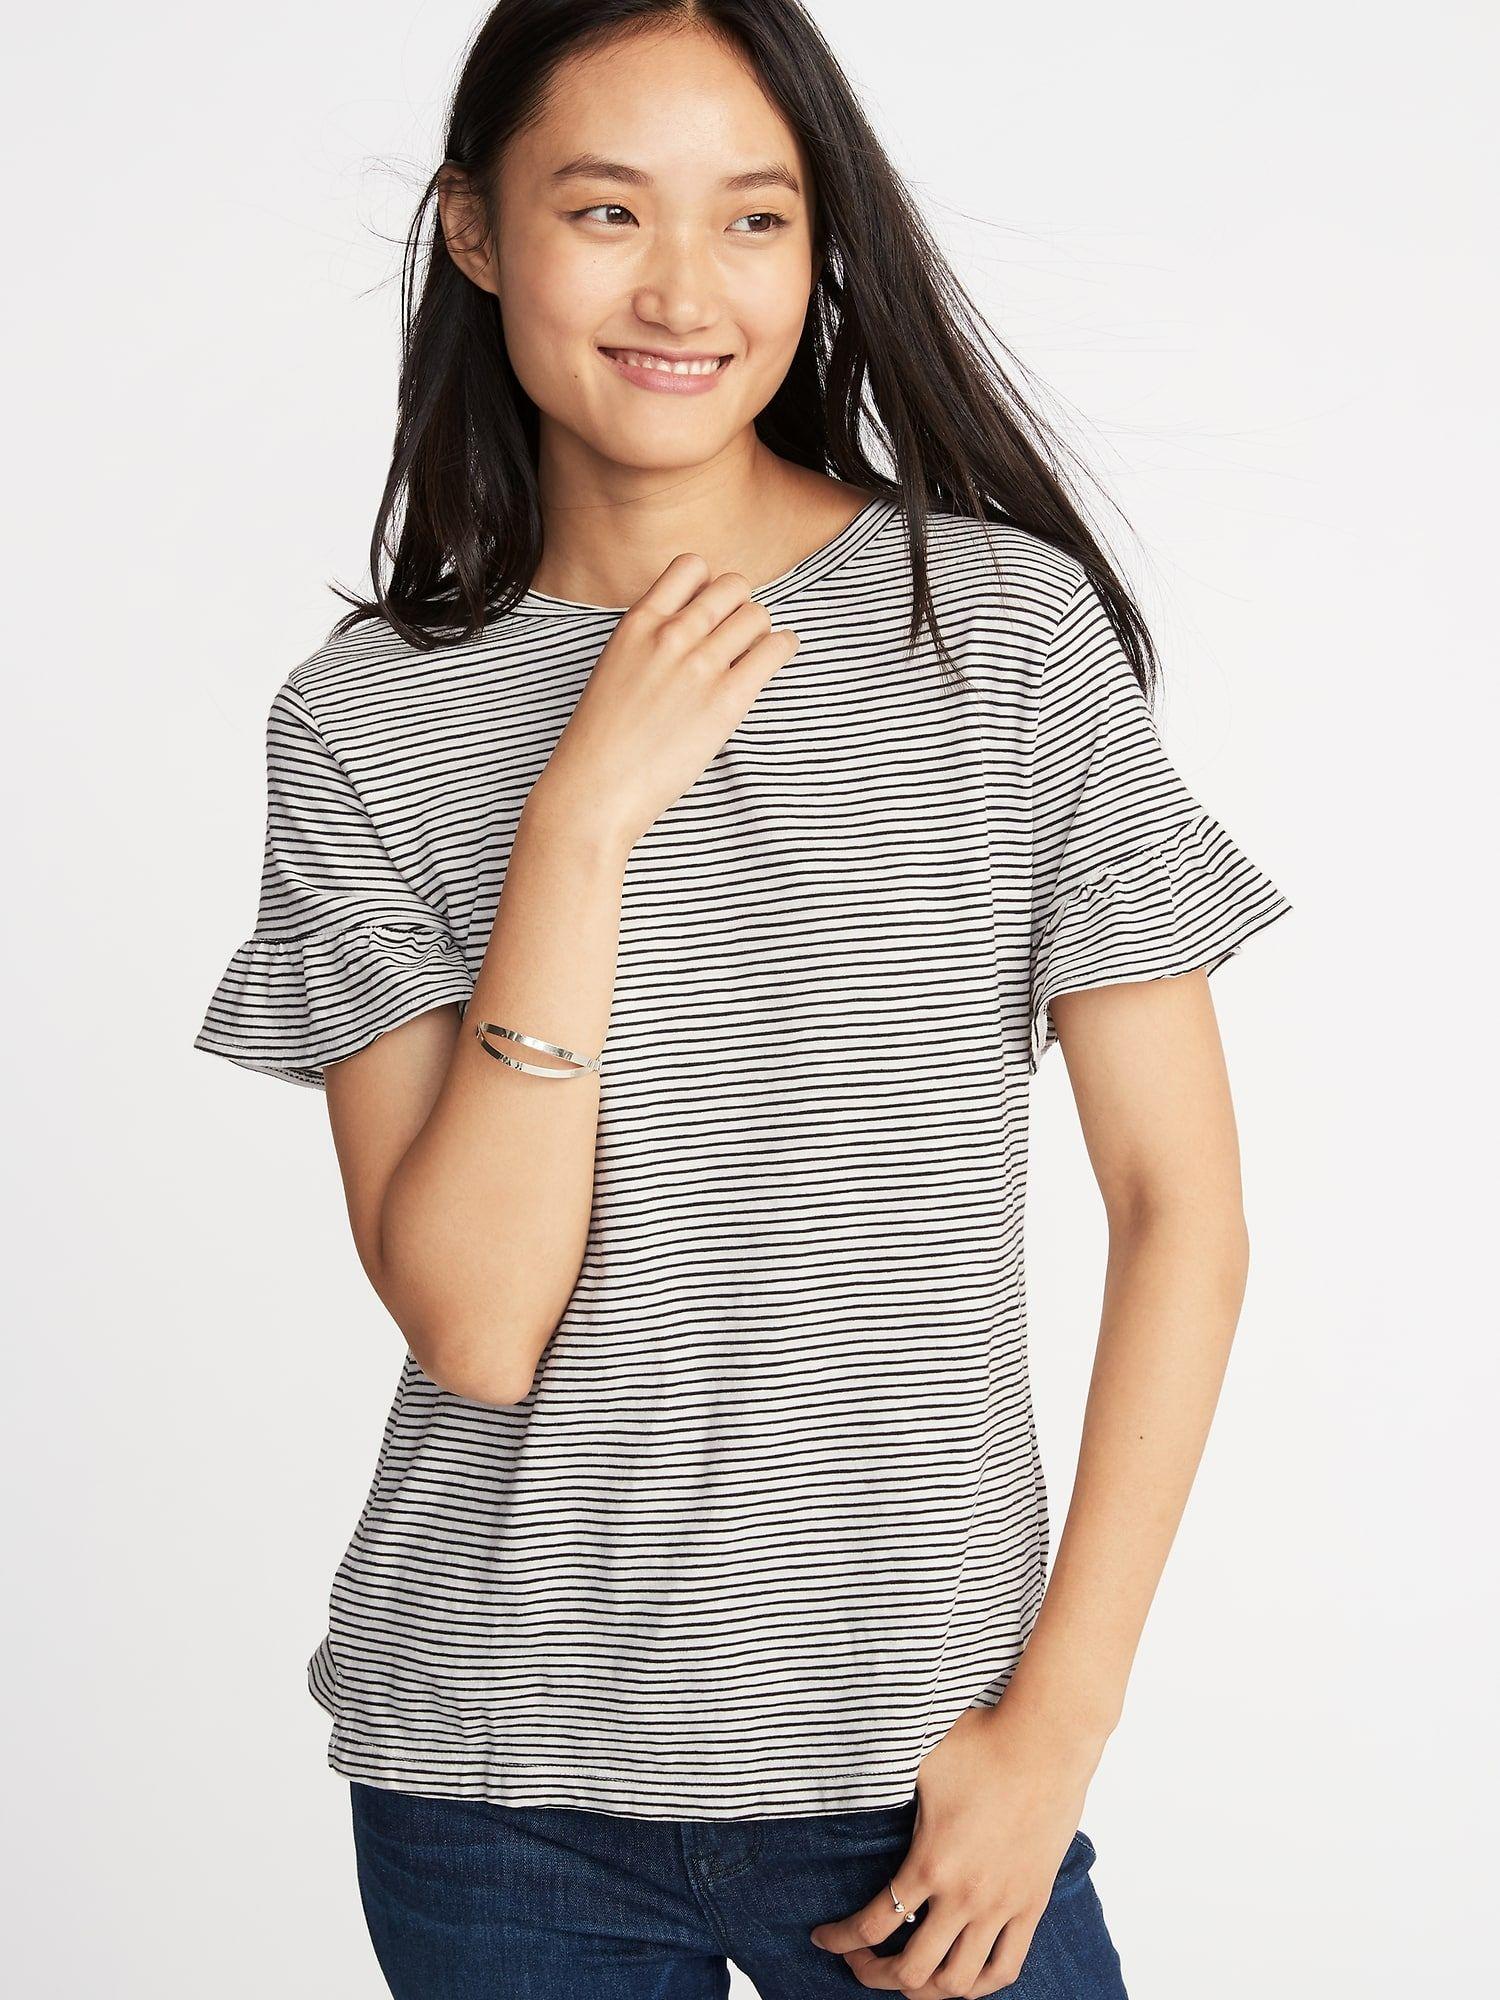 71fda56b957b53 Ruffle-Sleeve Slub-Knit Top for Women